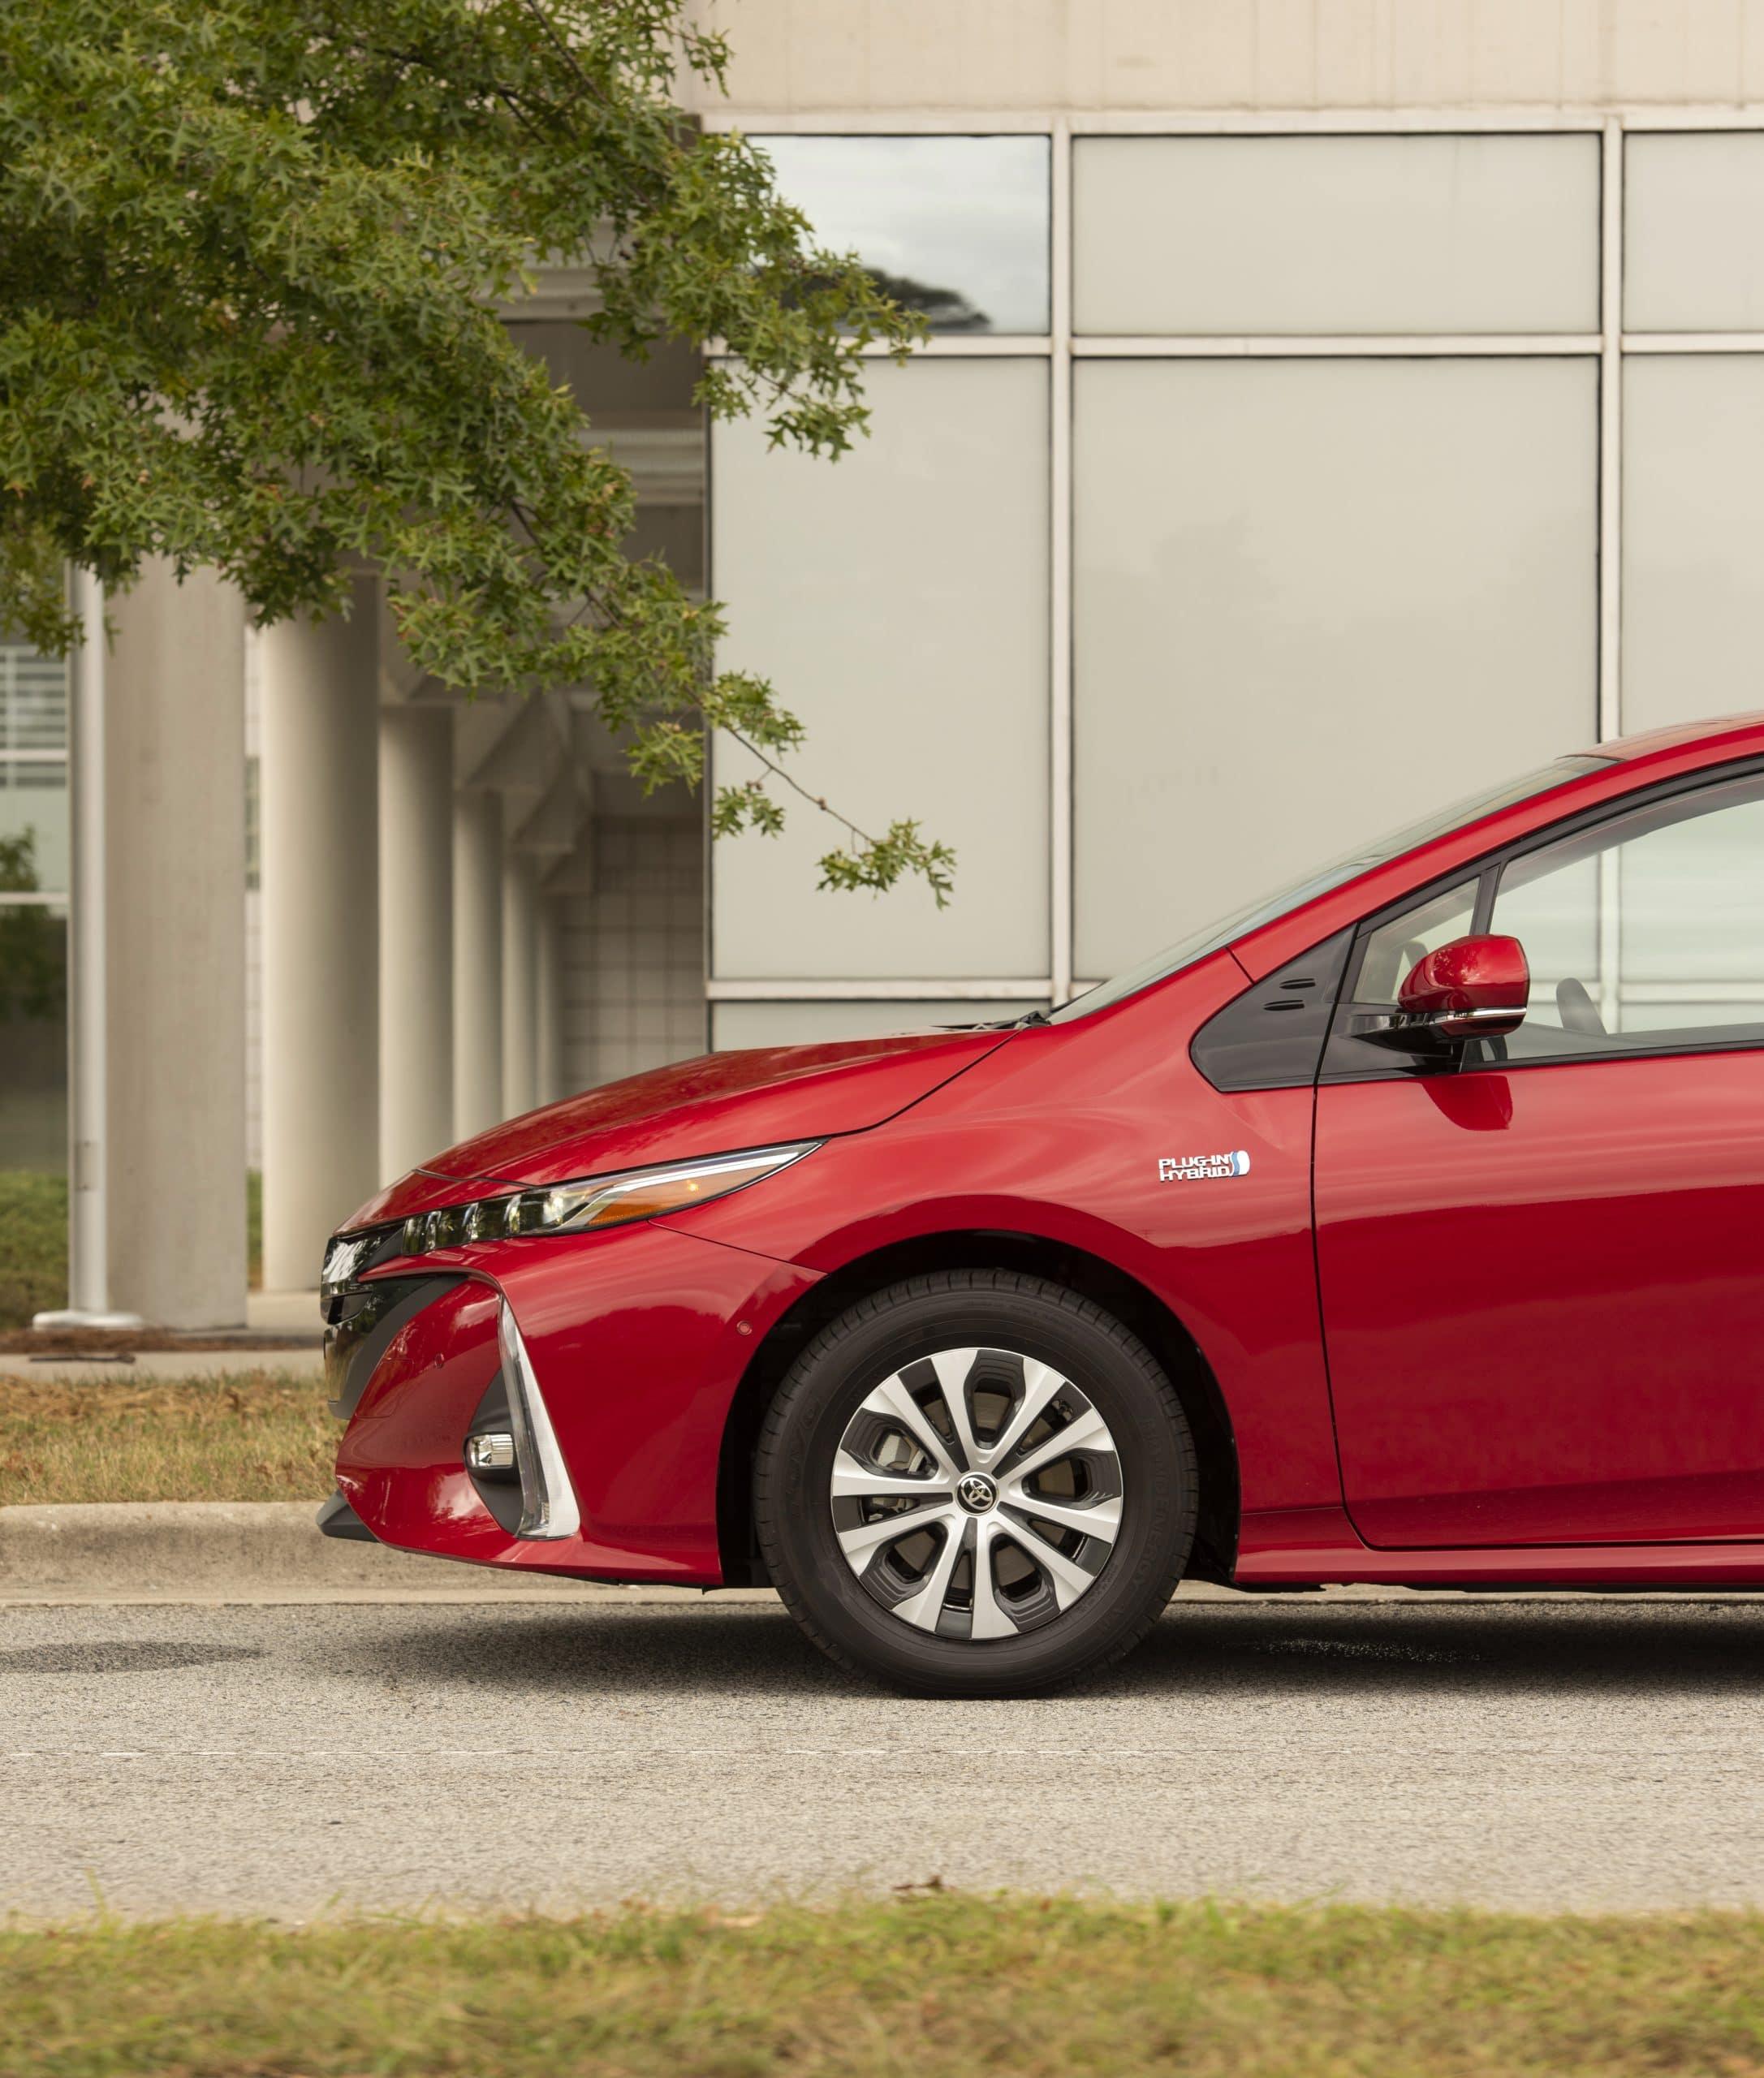 2020 Toyota Prius Prime Takes Hybrid Up a Notch